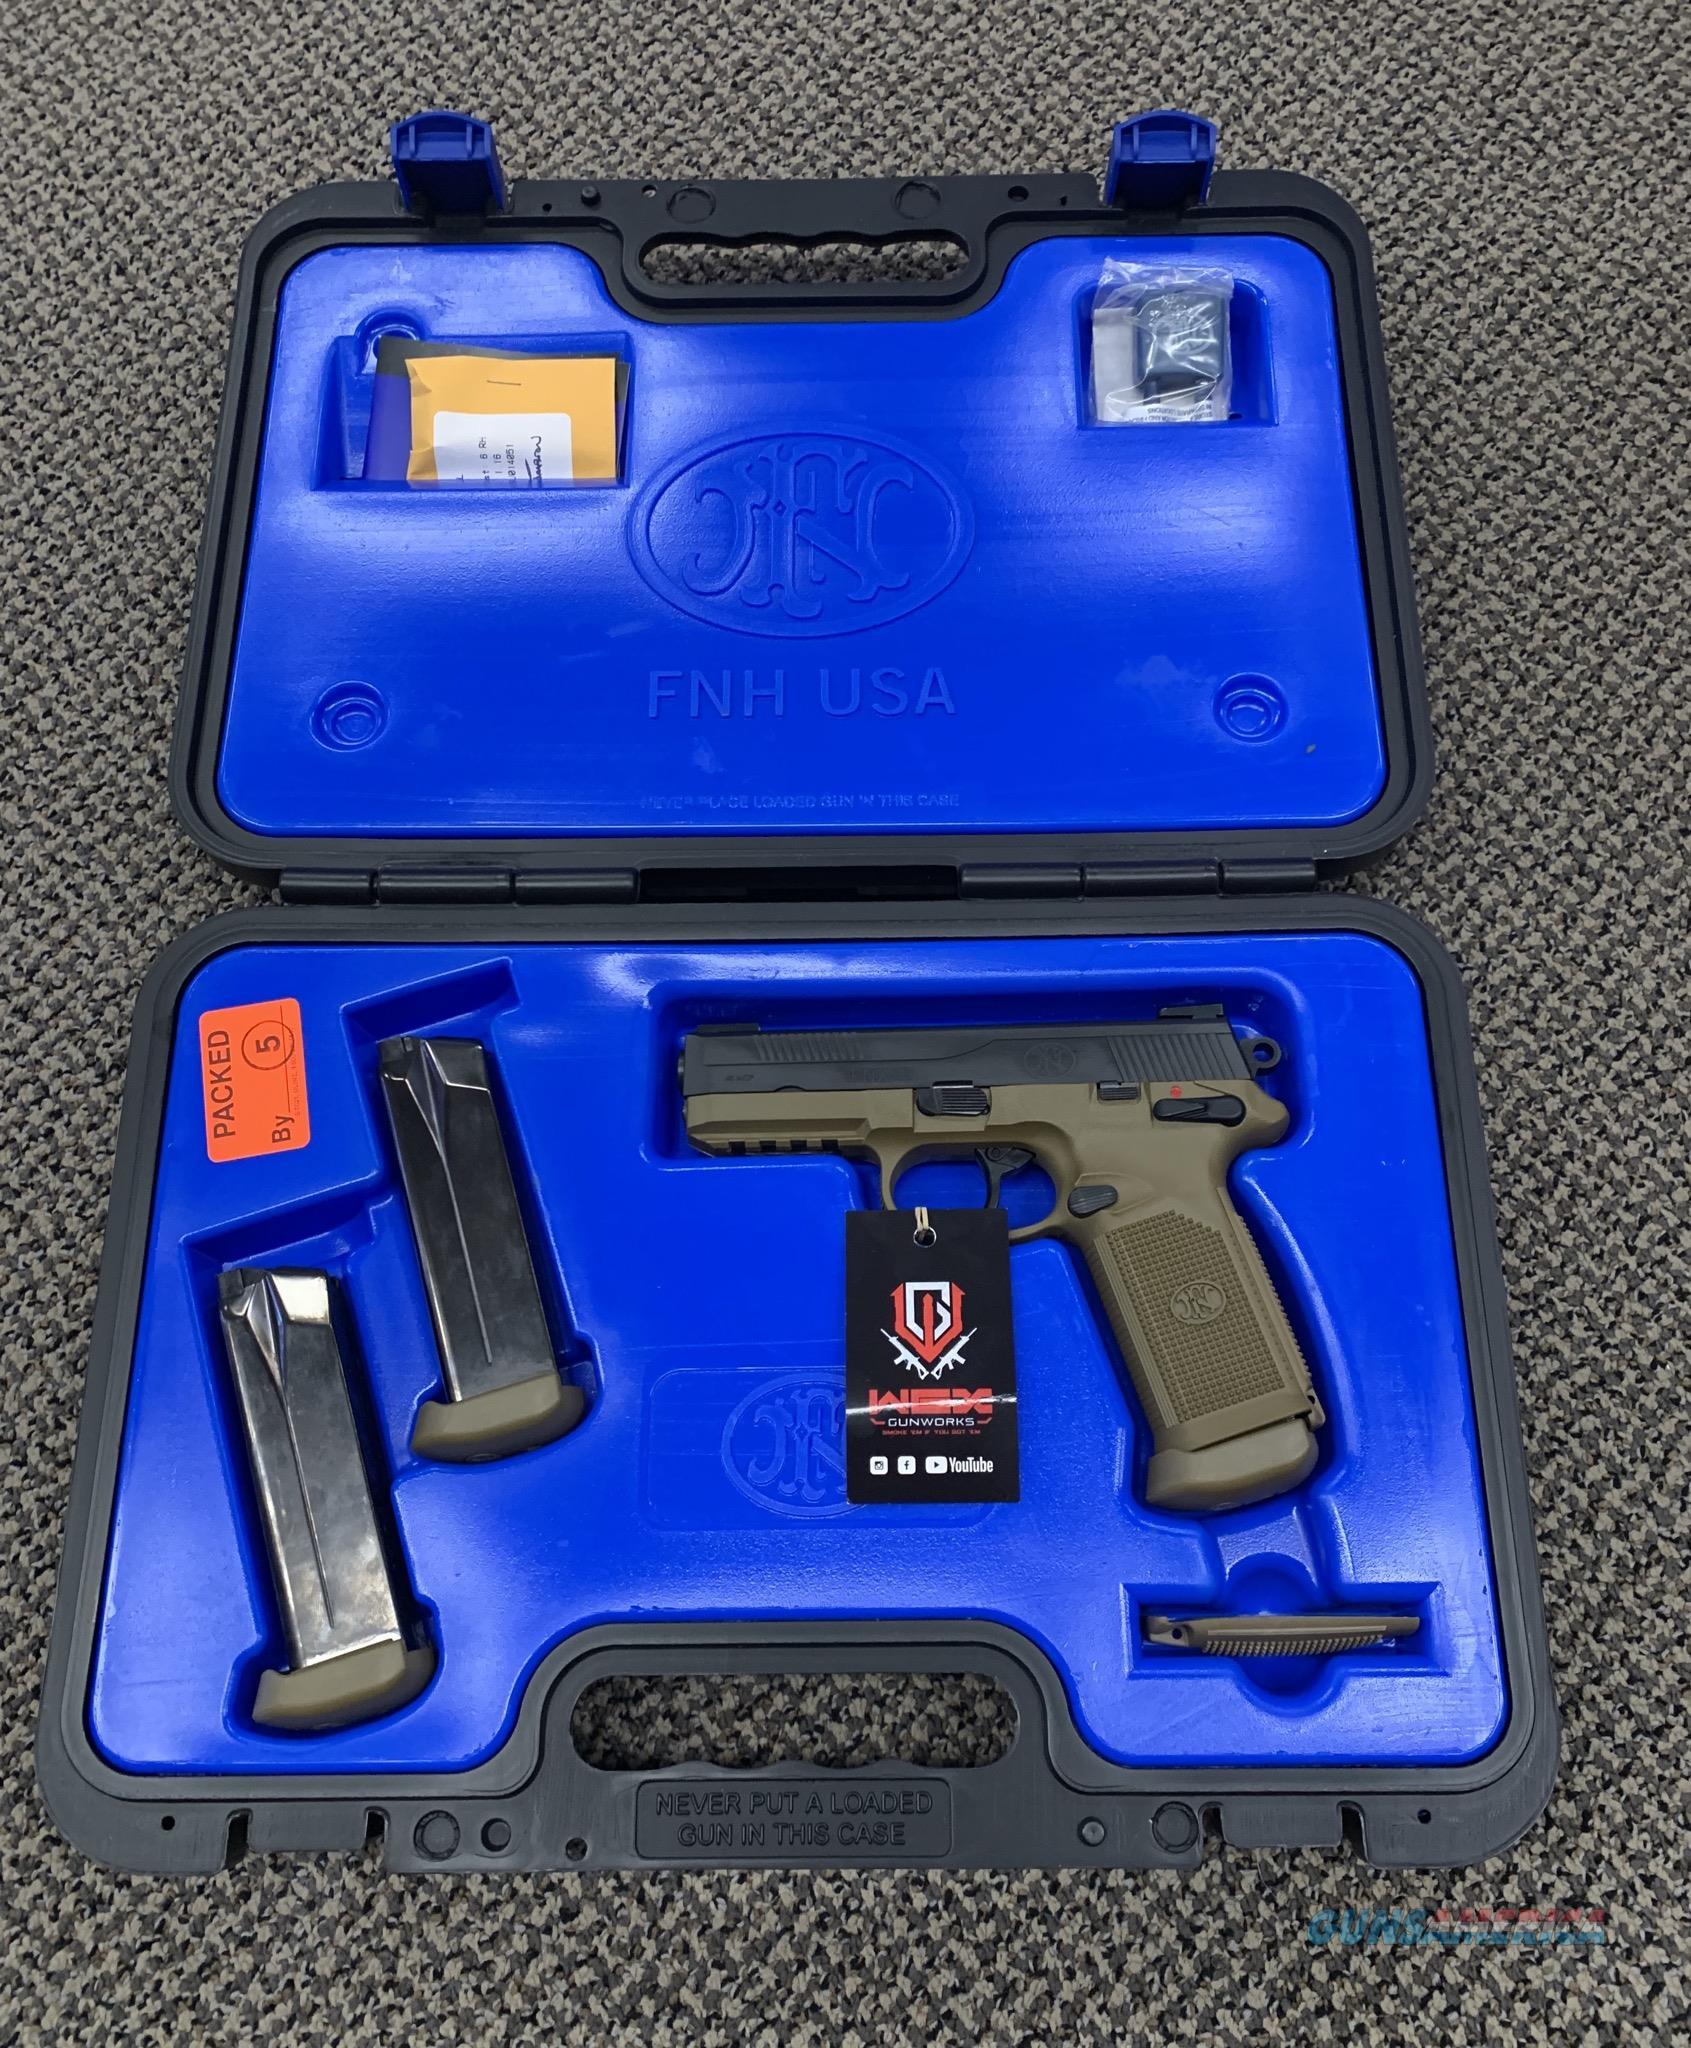 FN FNX 45 .45 ACP FDE BLACK SLIDE TRUGLO TFX NIGHT SIGHTS NEW IN BOX  Guns > Pistols > FNH - Fabrique Nationale (FN) Pistols > FNX